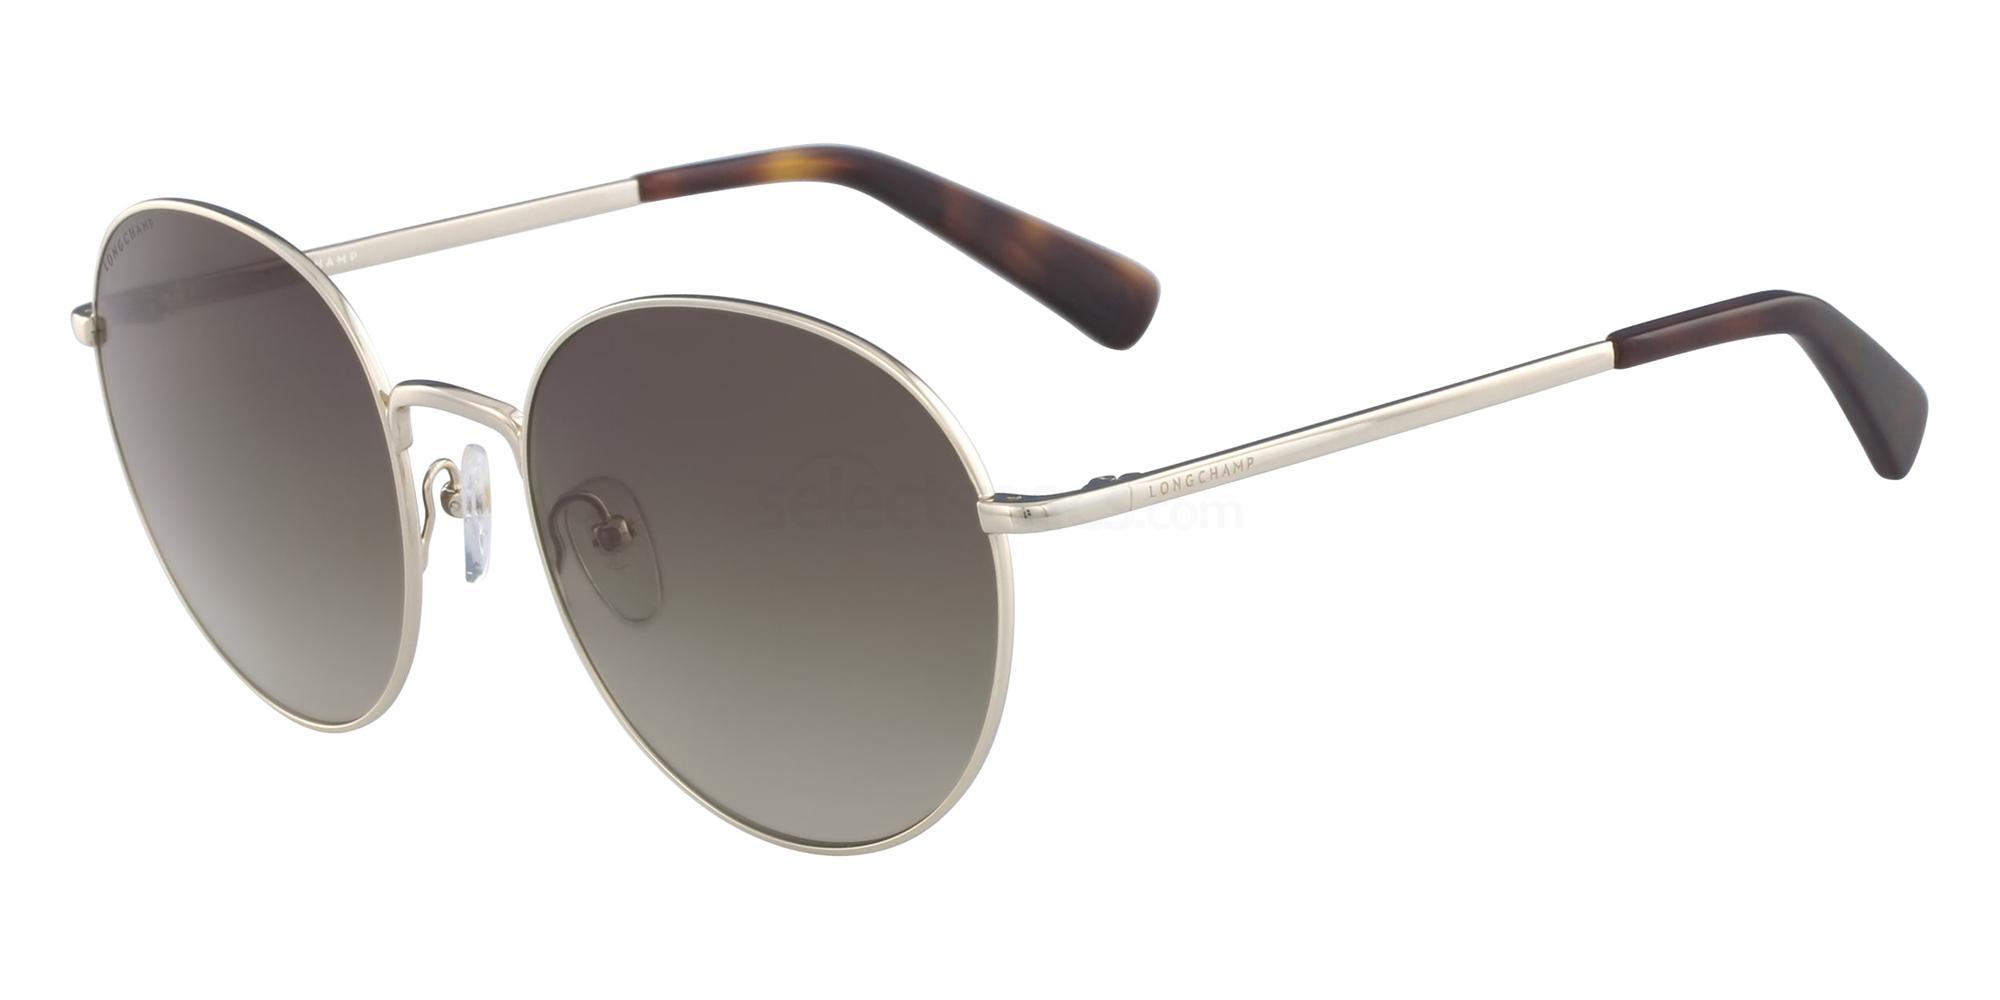 714 LO101S Sunglasses, LONGCHAMP